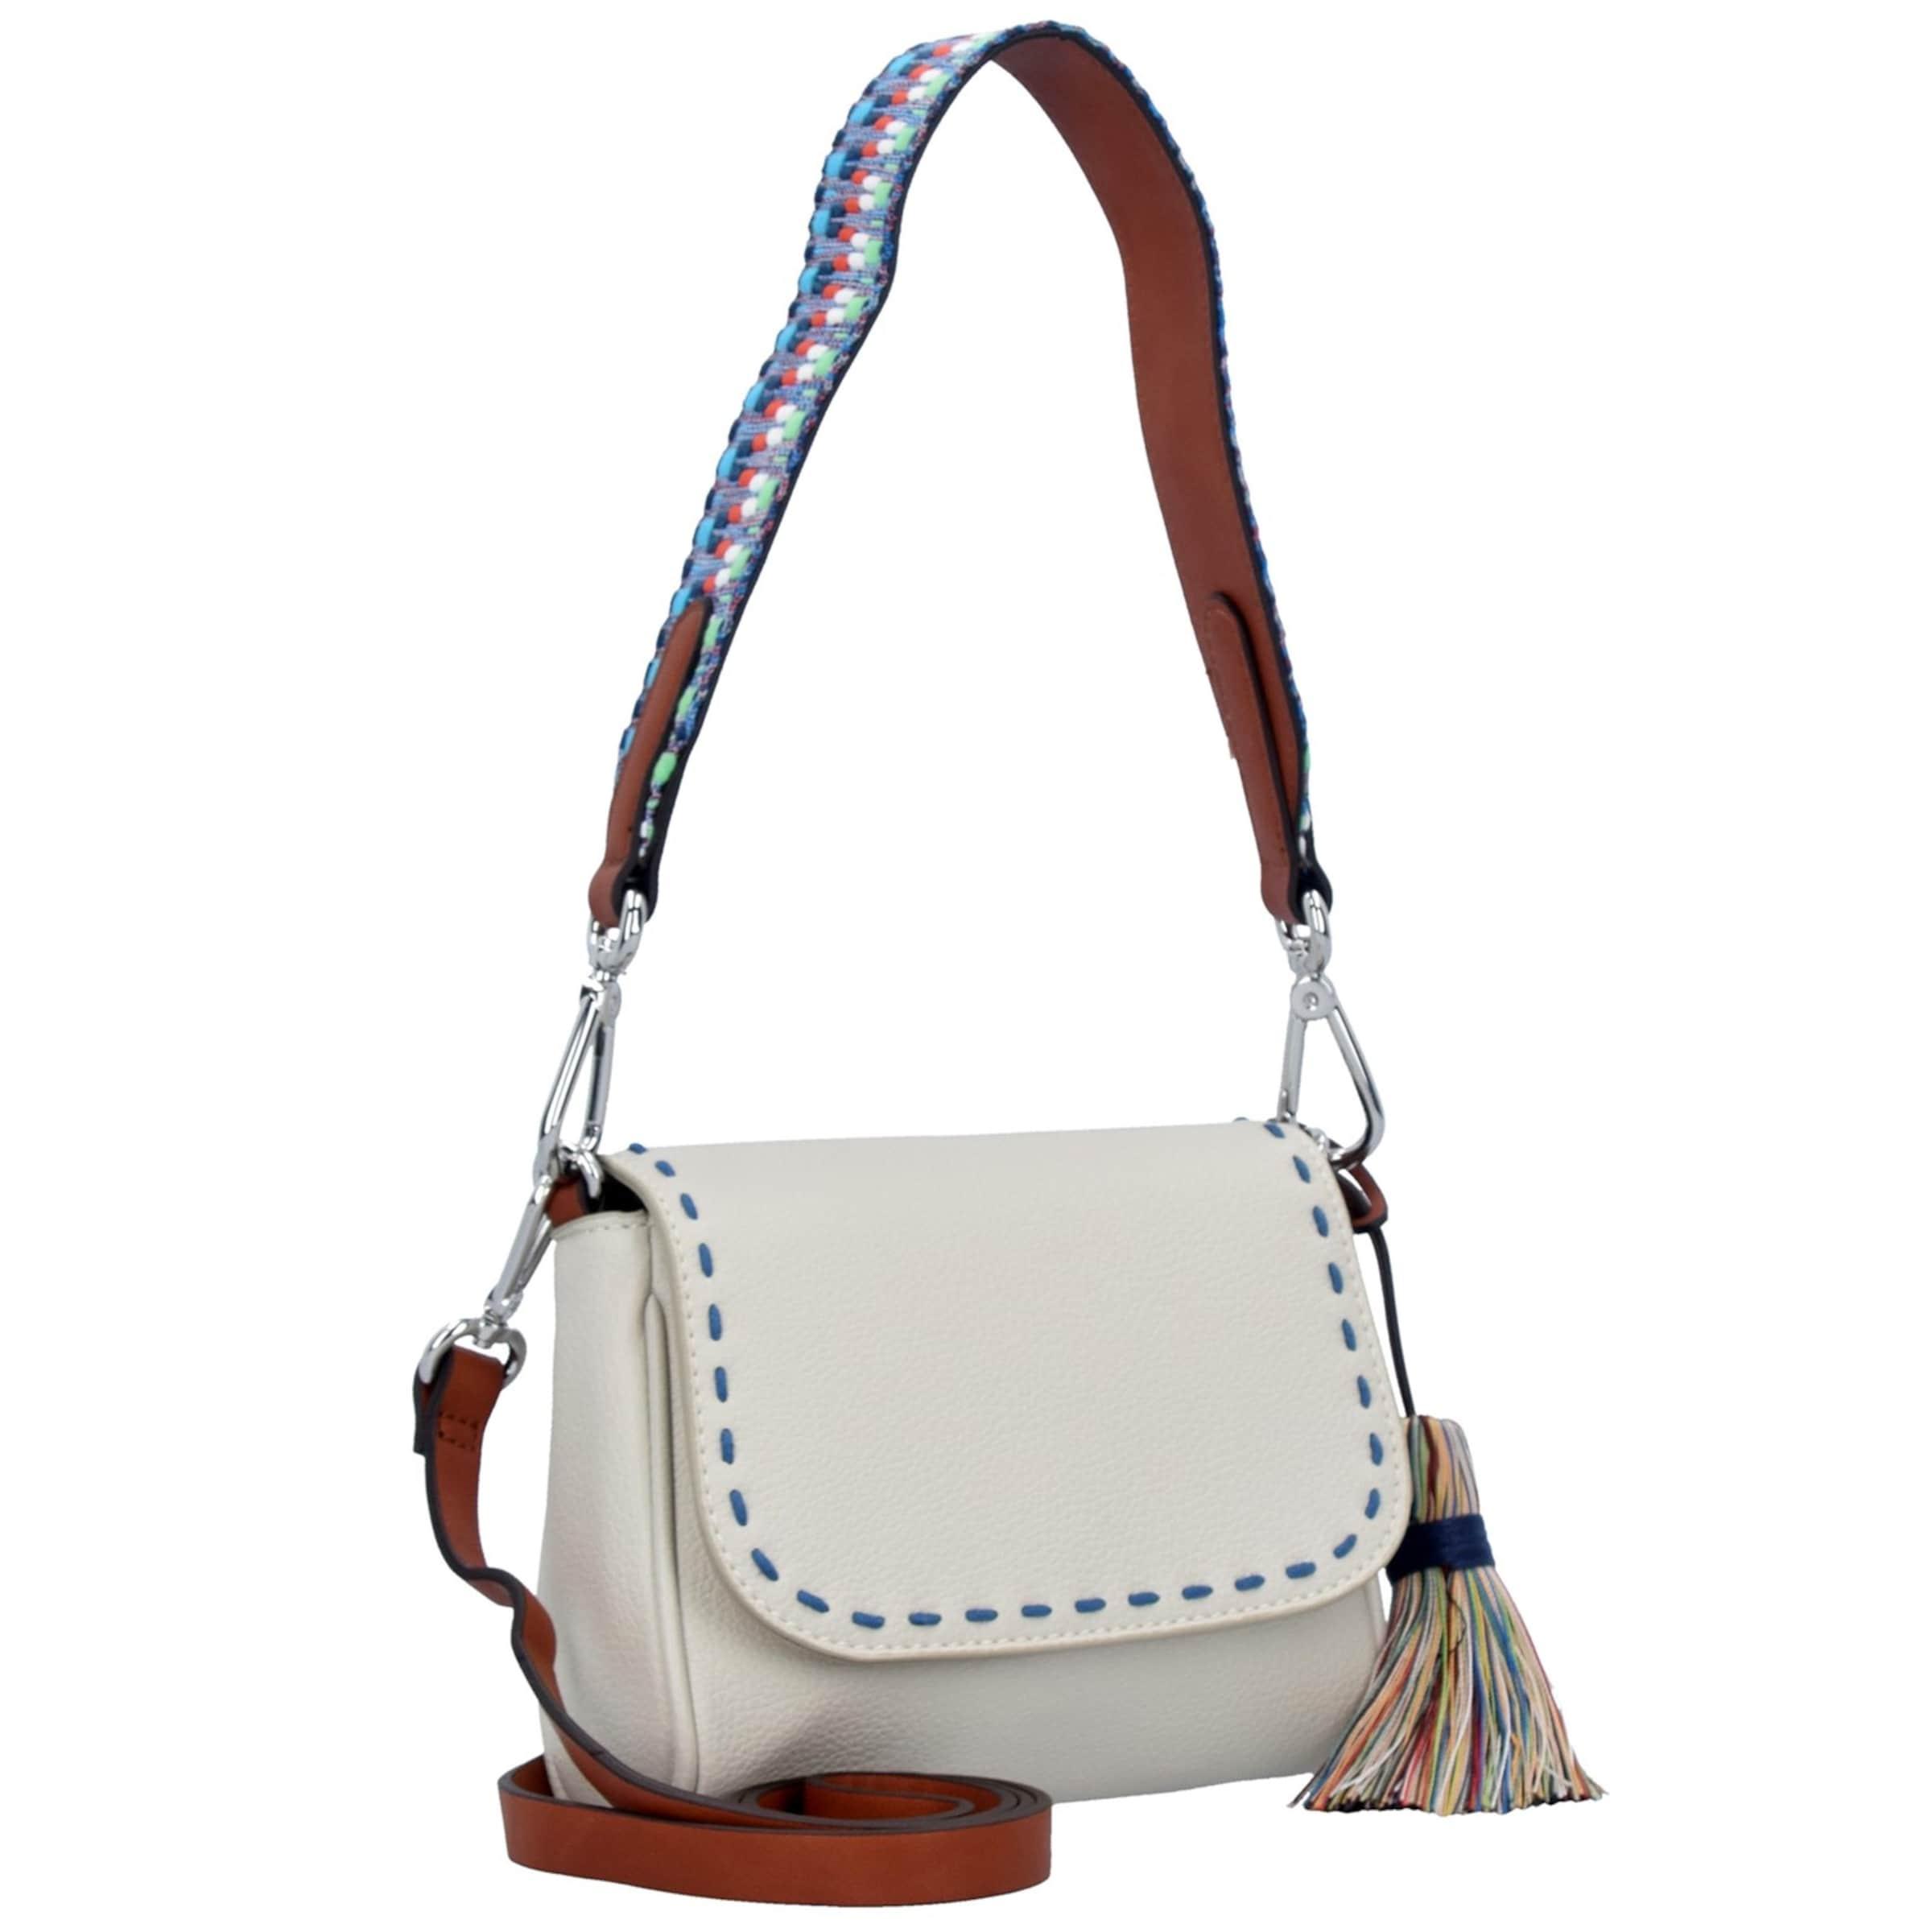 ESPRIT 'Tate Small' Schultertasche 27 cm Billig Verkauf Eastbay Großhandelspreis Y0Om2ki3pY